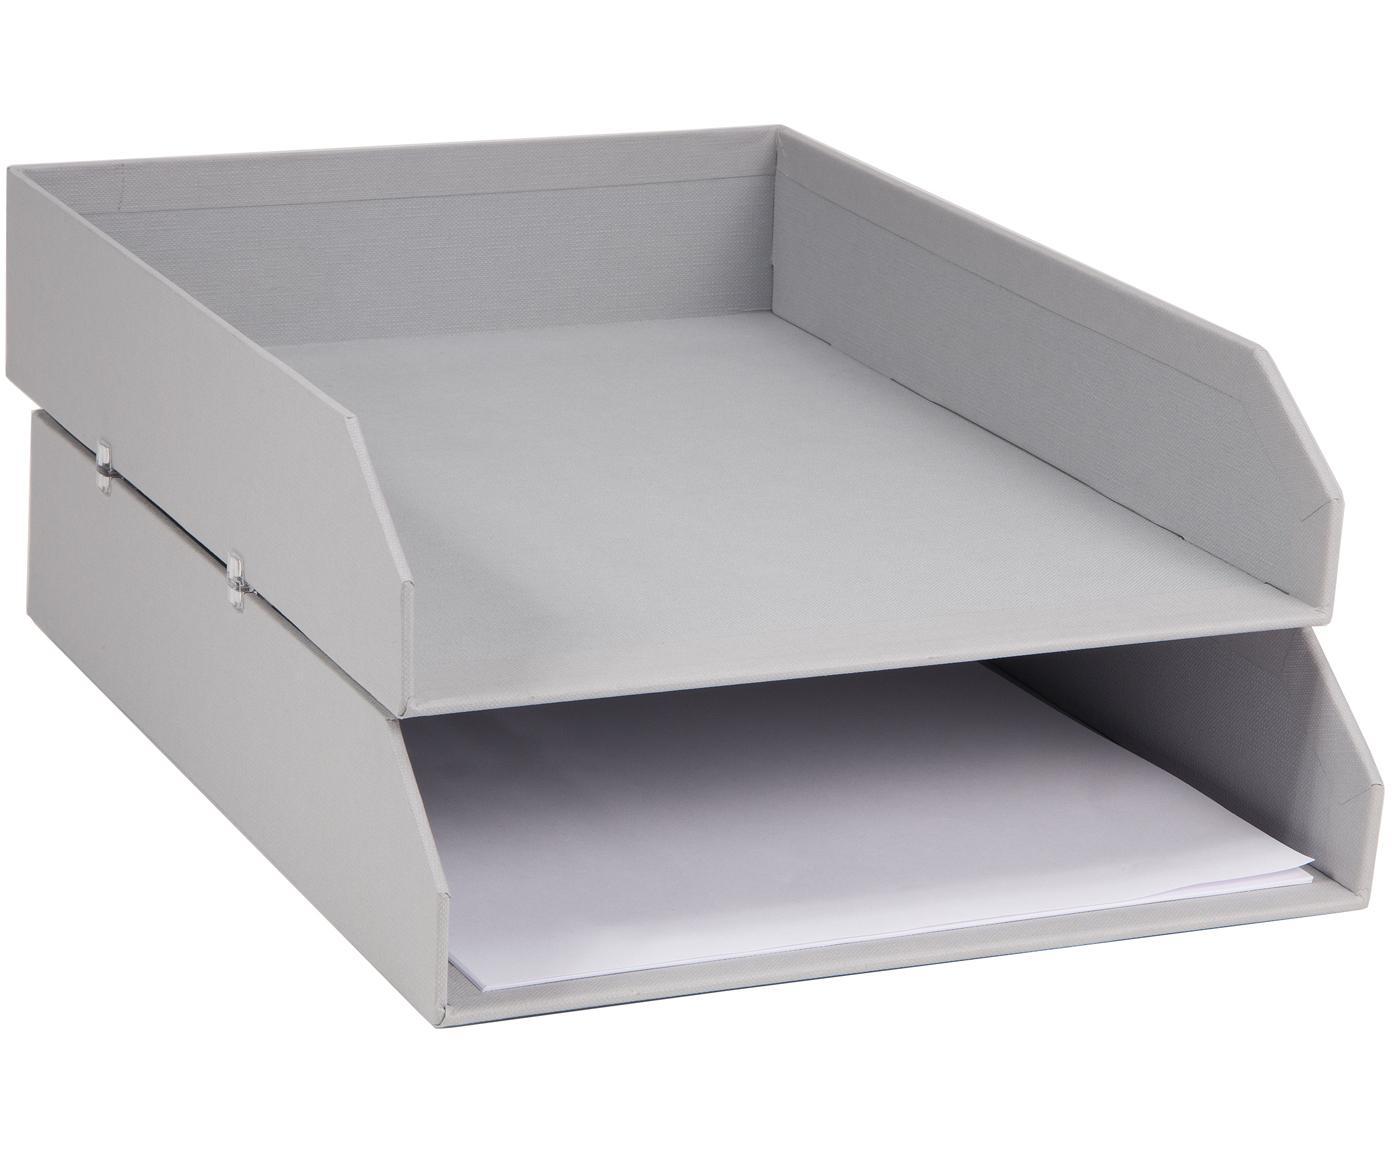 Dokumenten-Ablagen Hakan, 2 Stück, Fester, laminierter Karton, Hellgrau, B 23 x T 31 cm